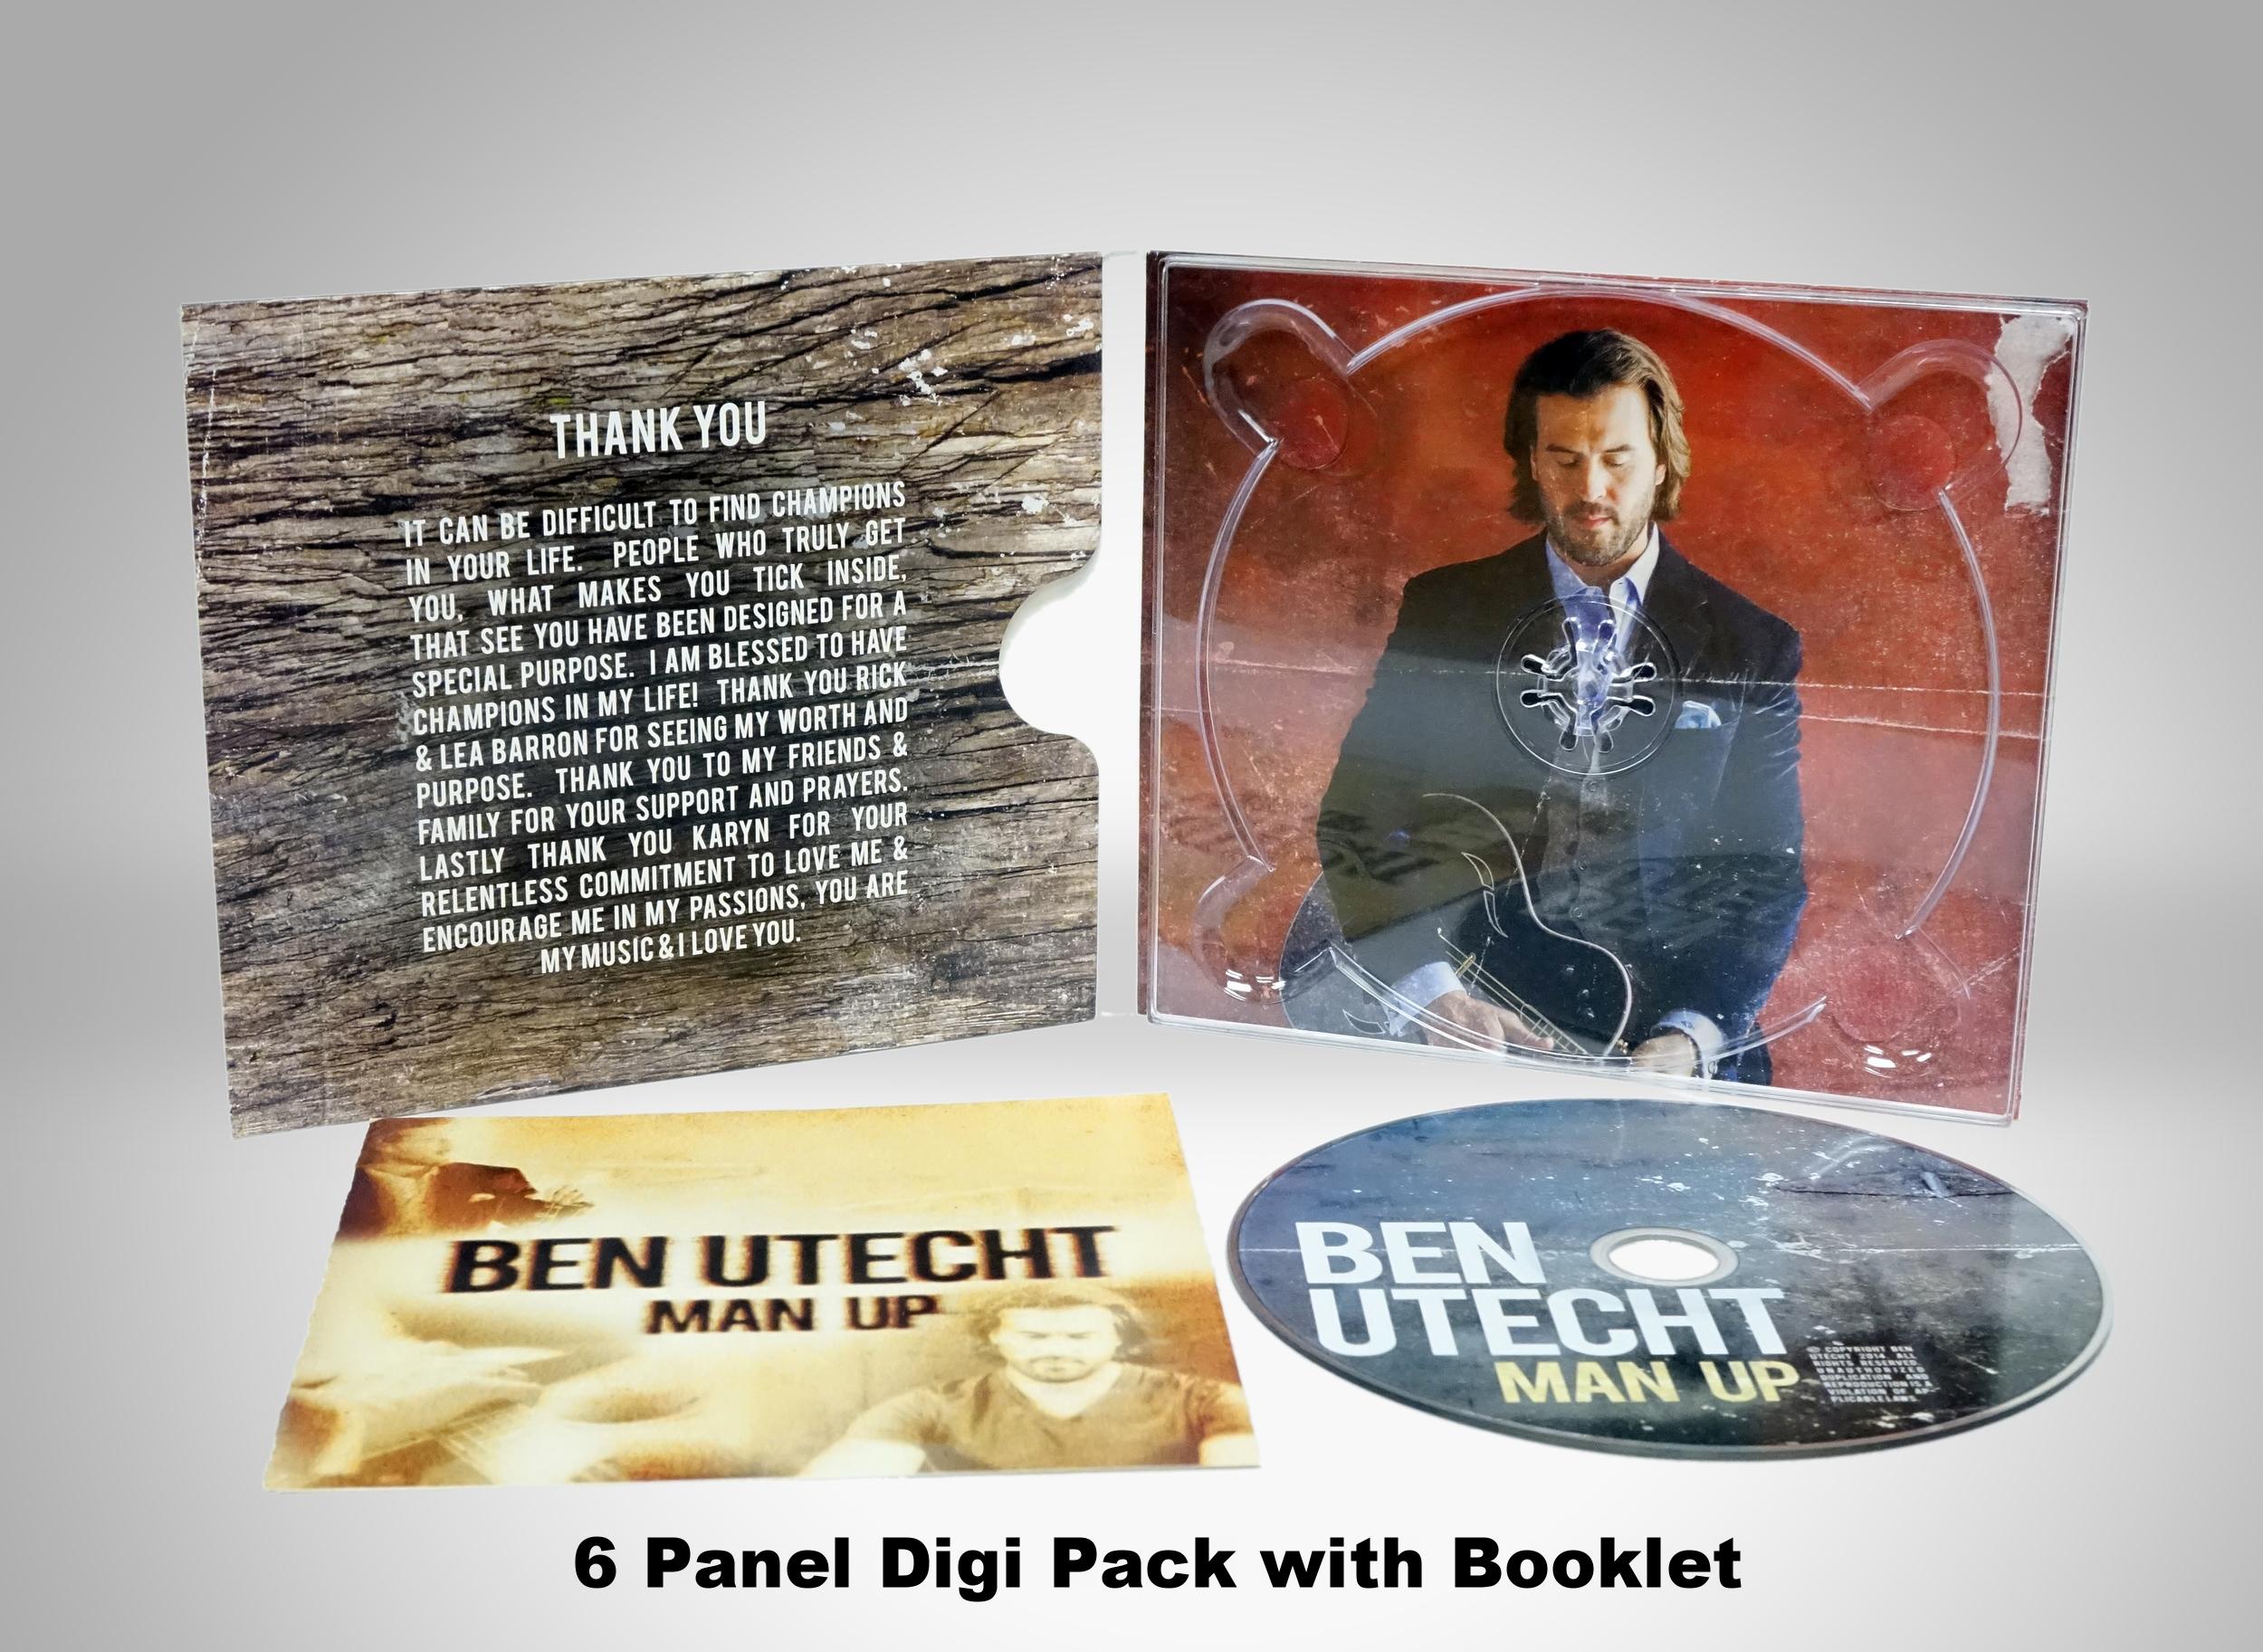 4 Panel Digi Pak_with Booklet_BenUtech.jpg